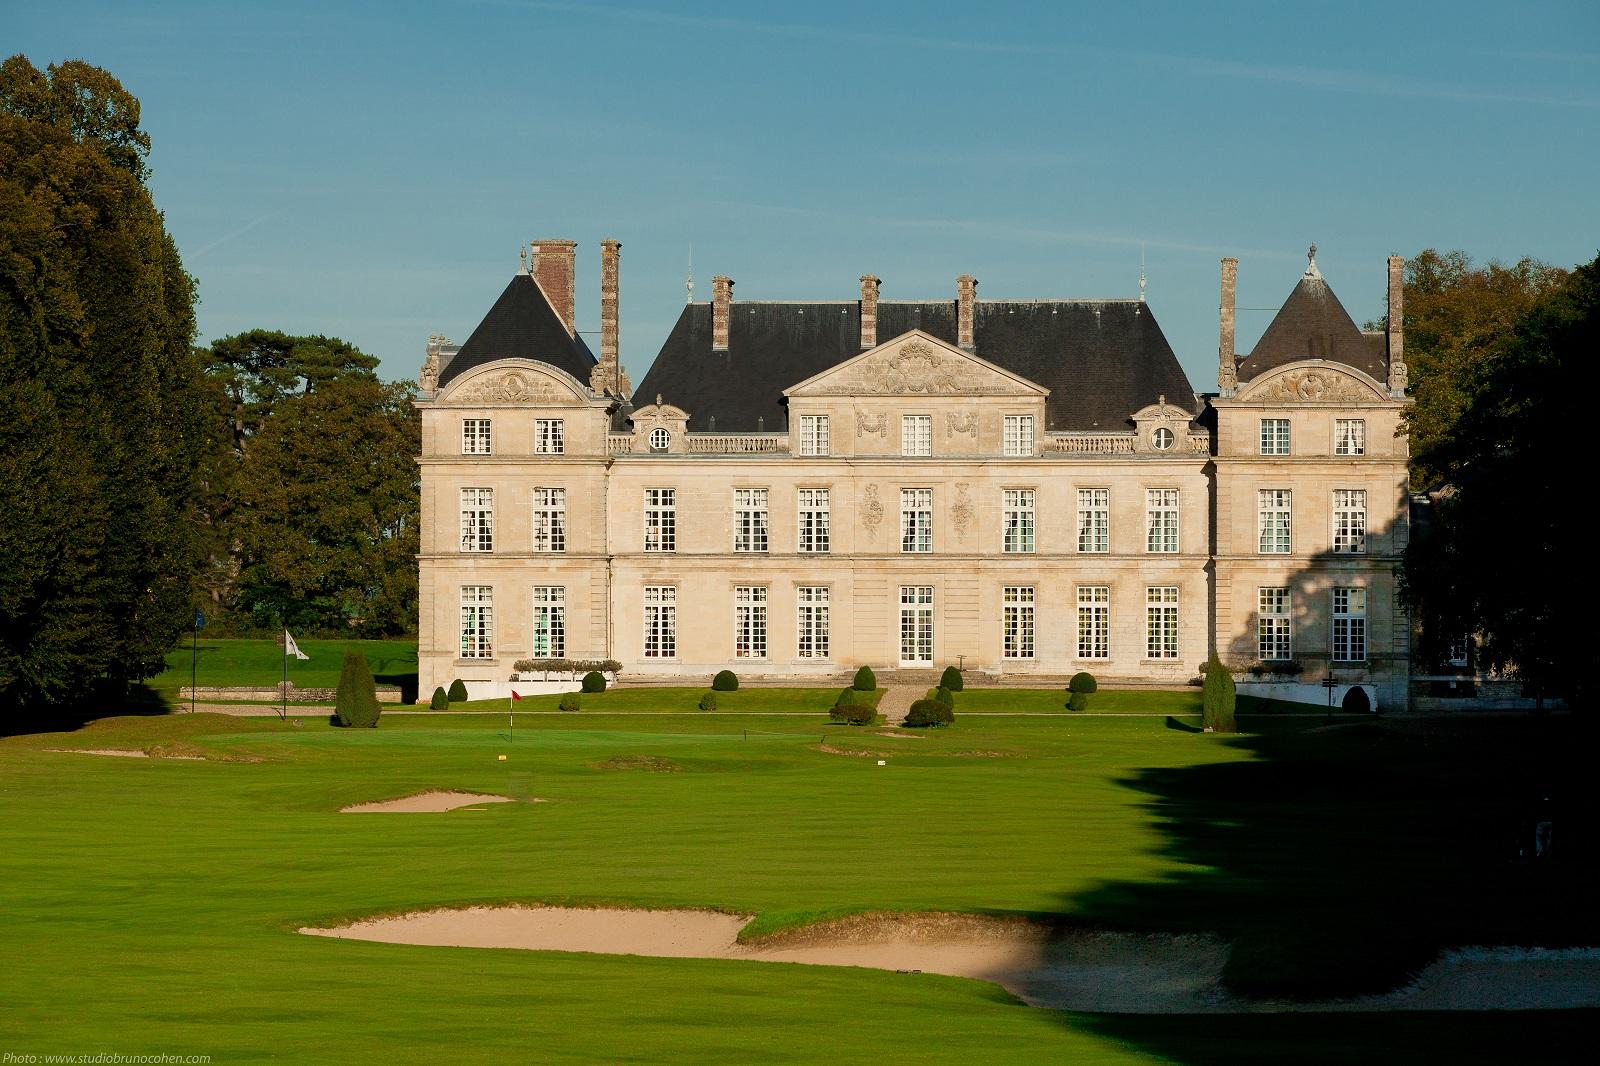 UGOLF Château de Raray 16